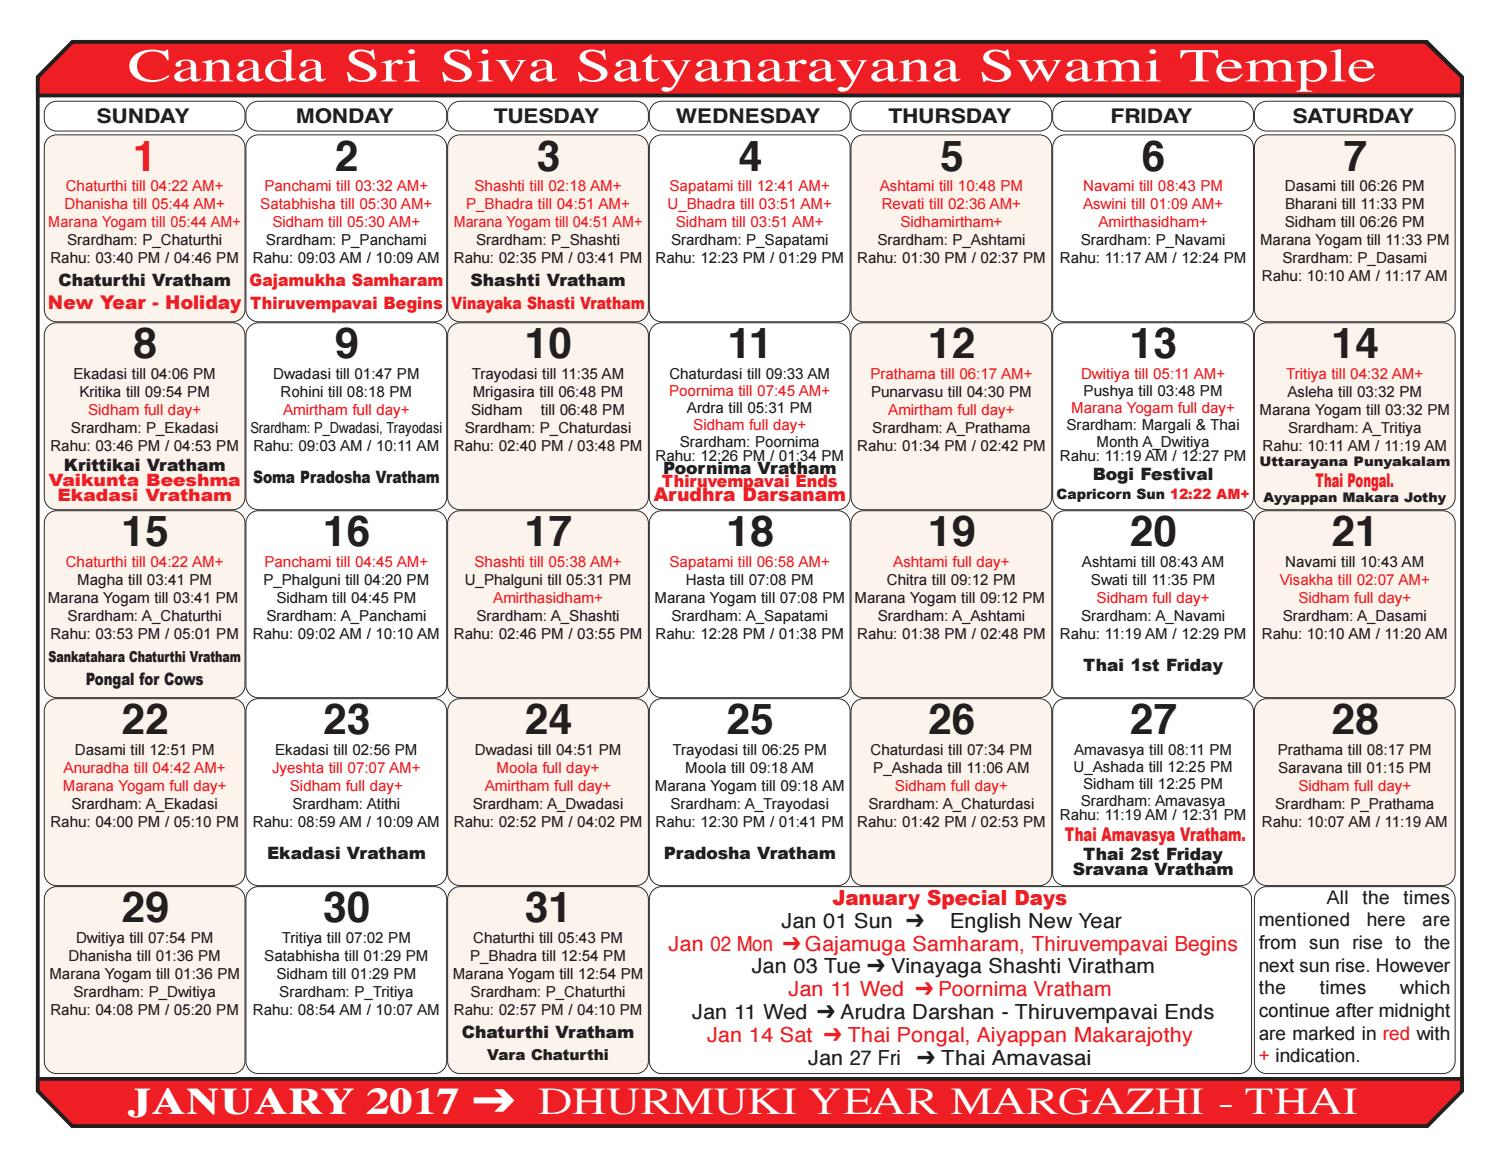 2017 Siva Temple Calendar by dynasoftca - issuu